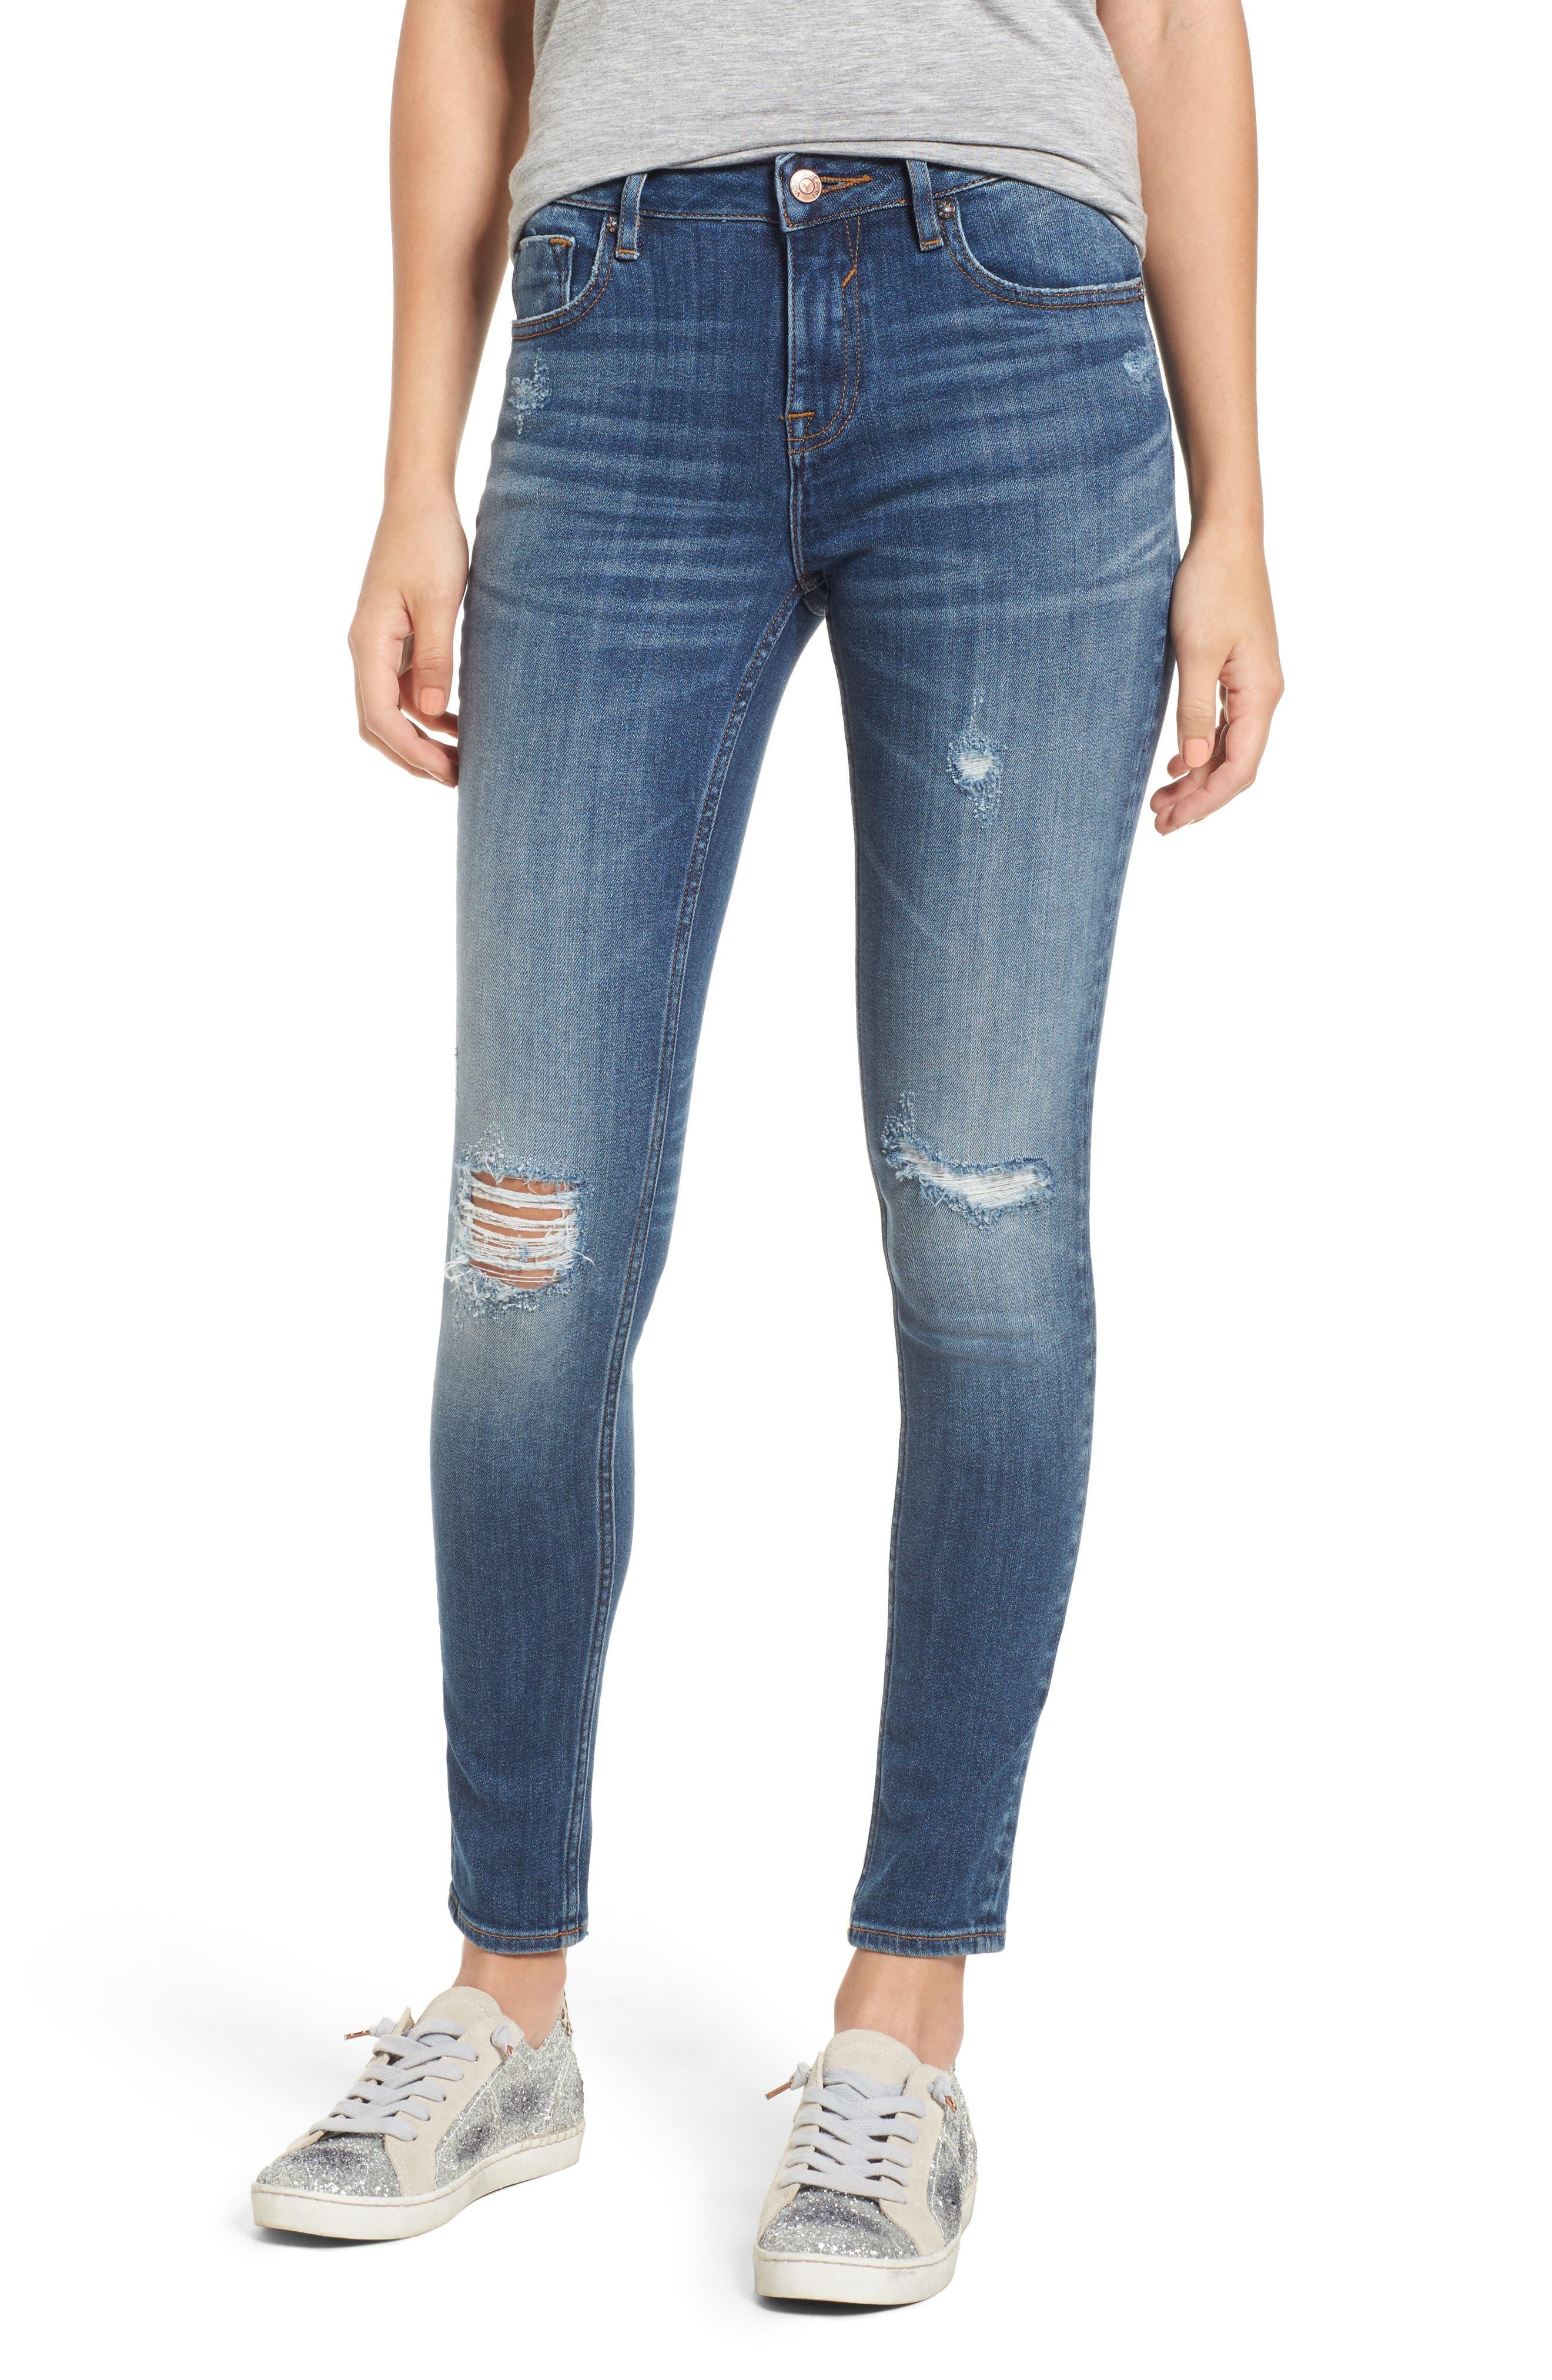 Good value skinny jeans